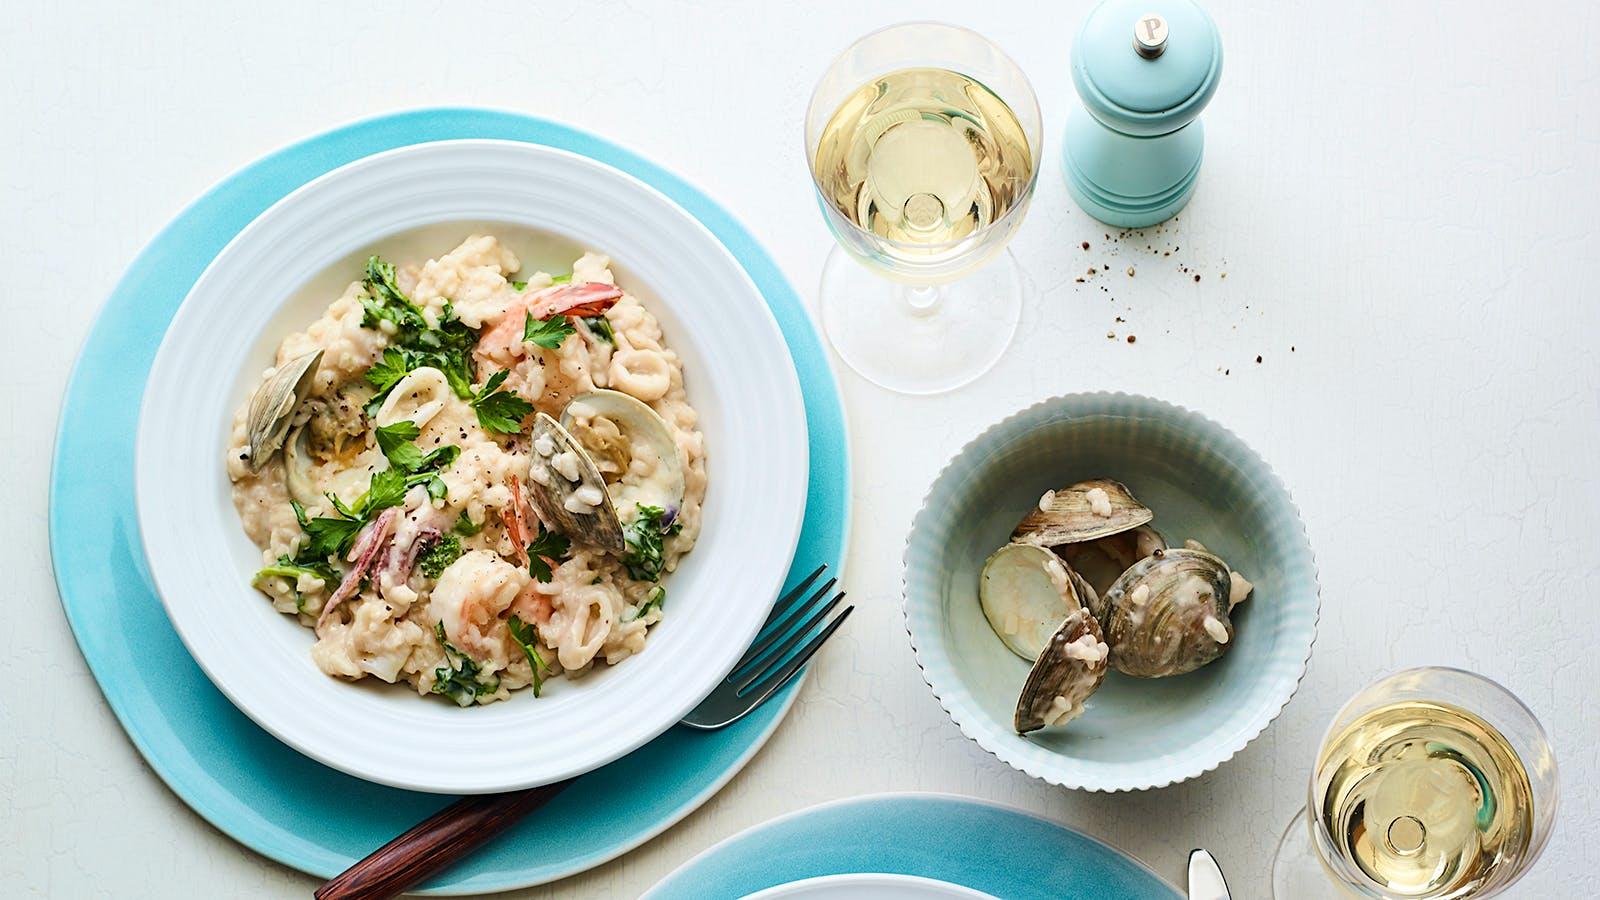 Seafood Risotto with Broccoli Raab